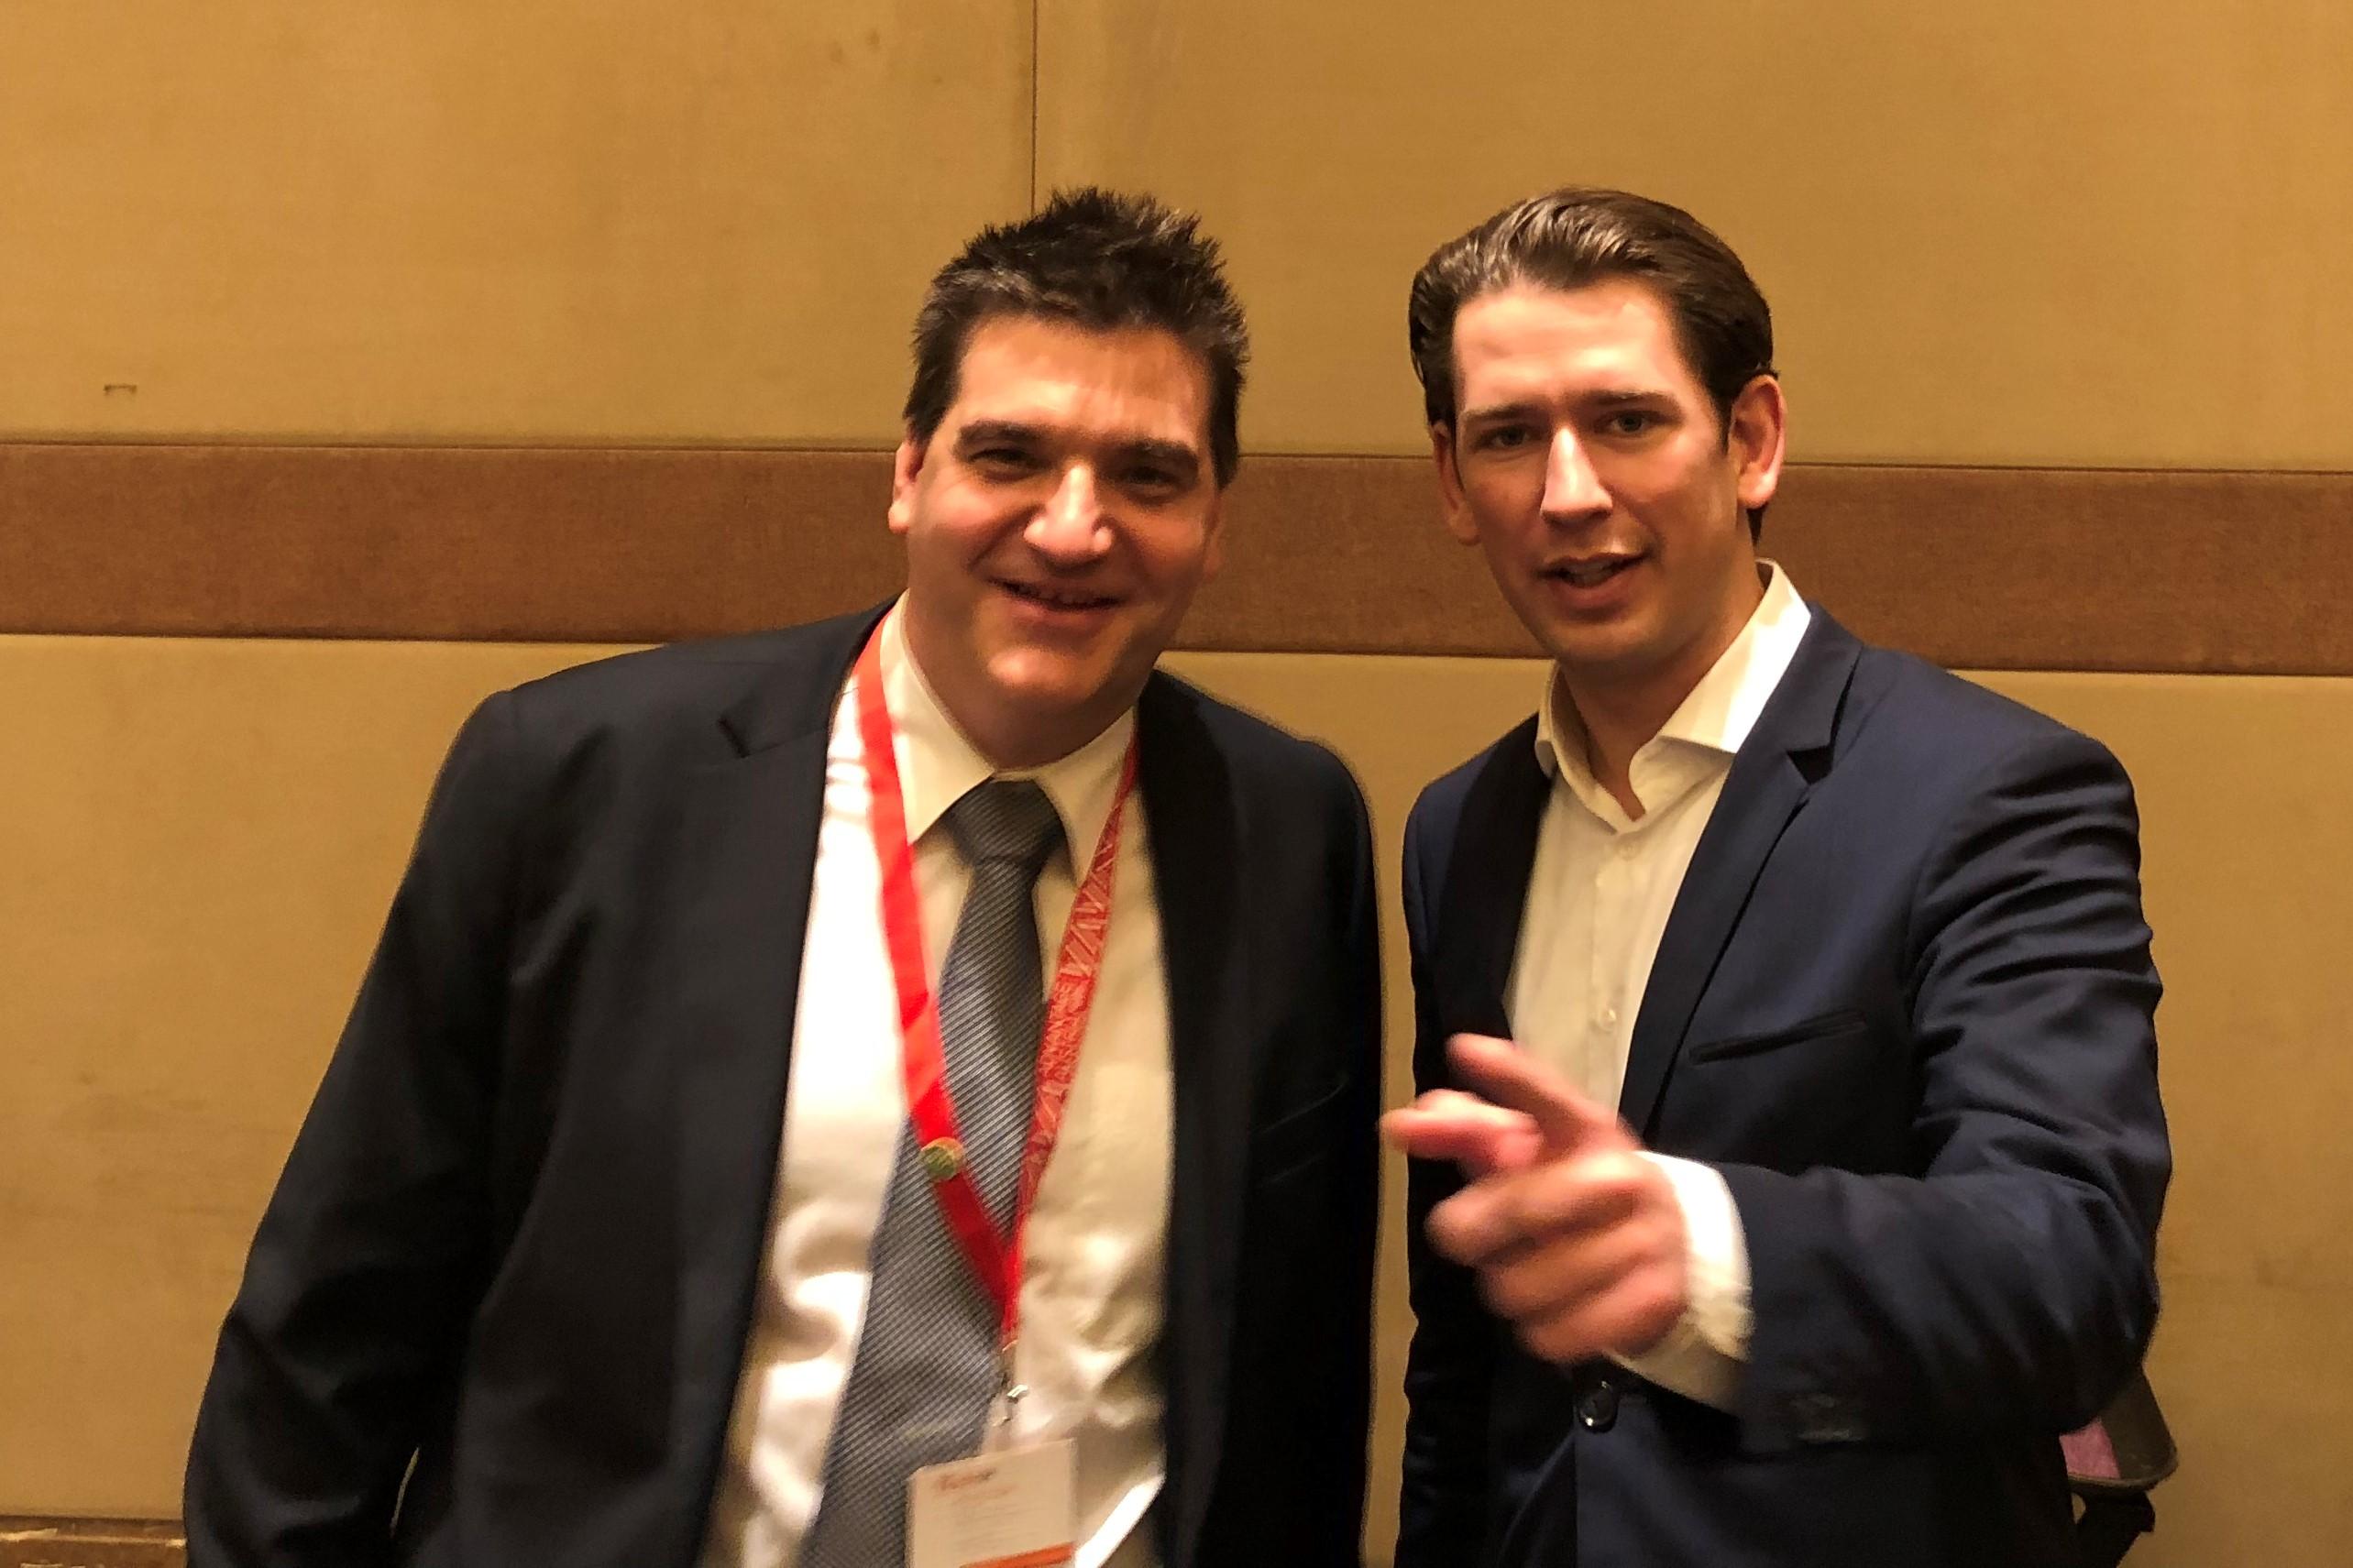 Michael Weilguny und Bundeskanzler Sebastian Kurz, China 2018